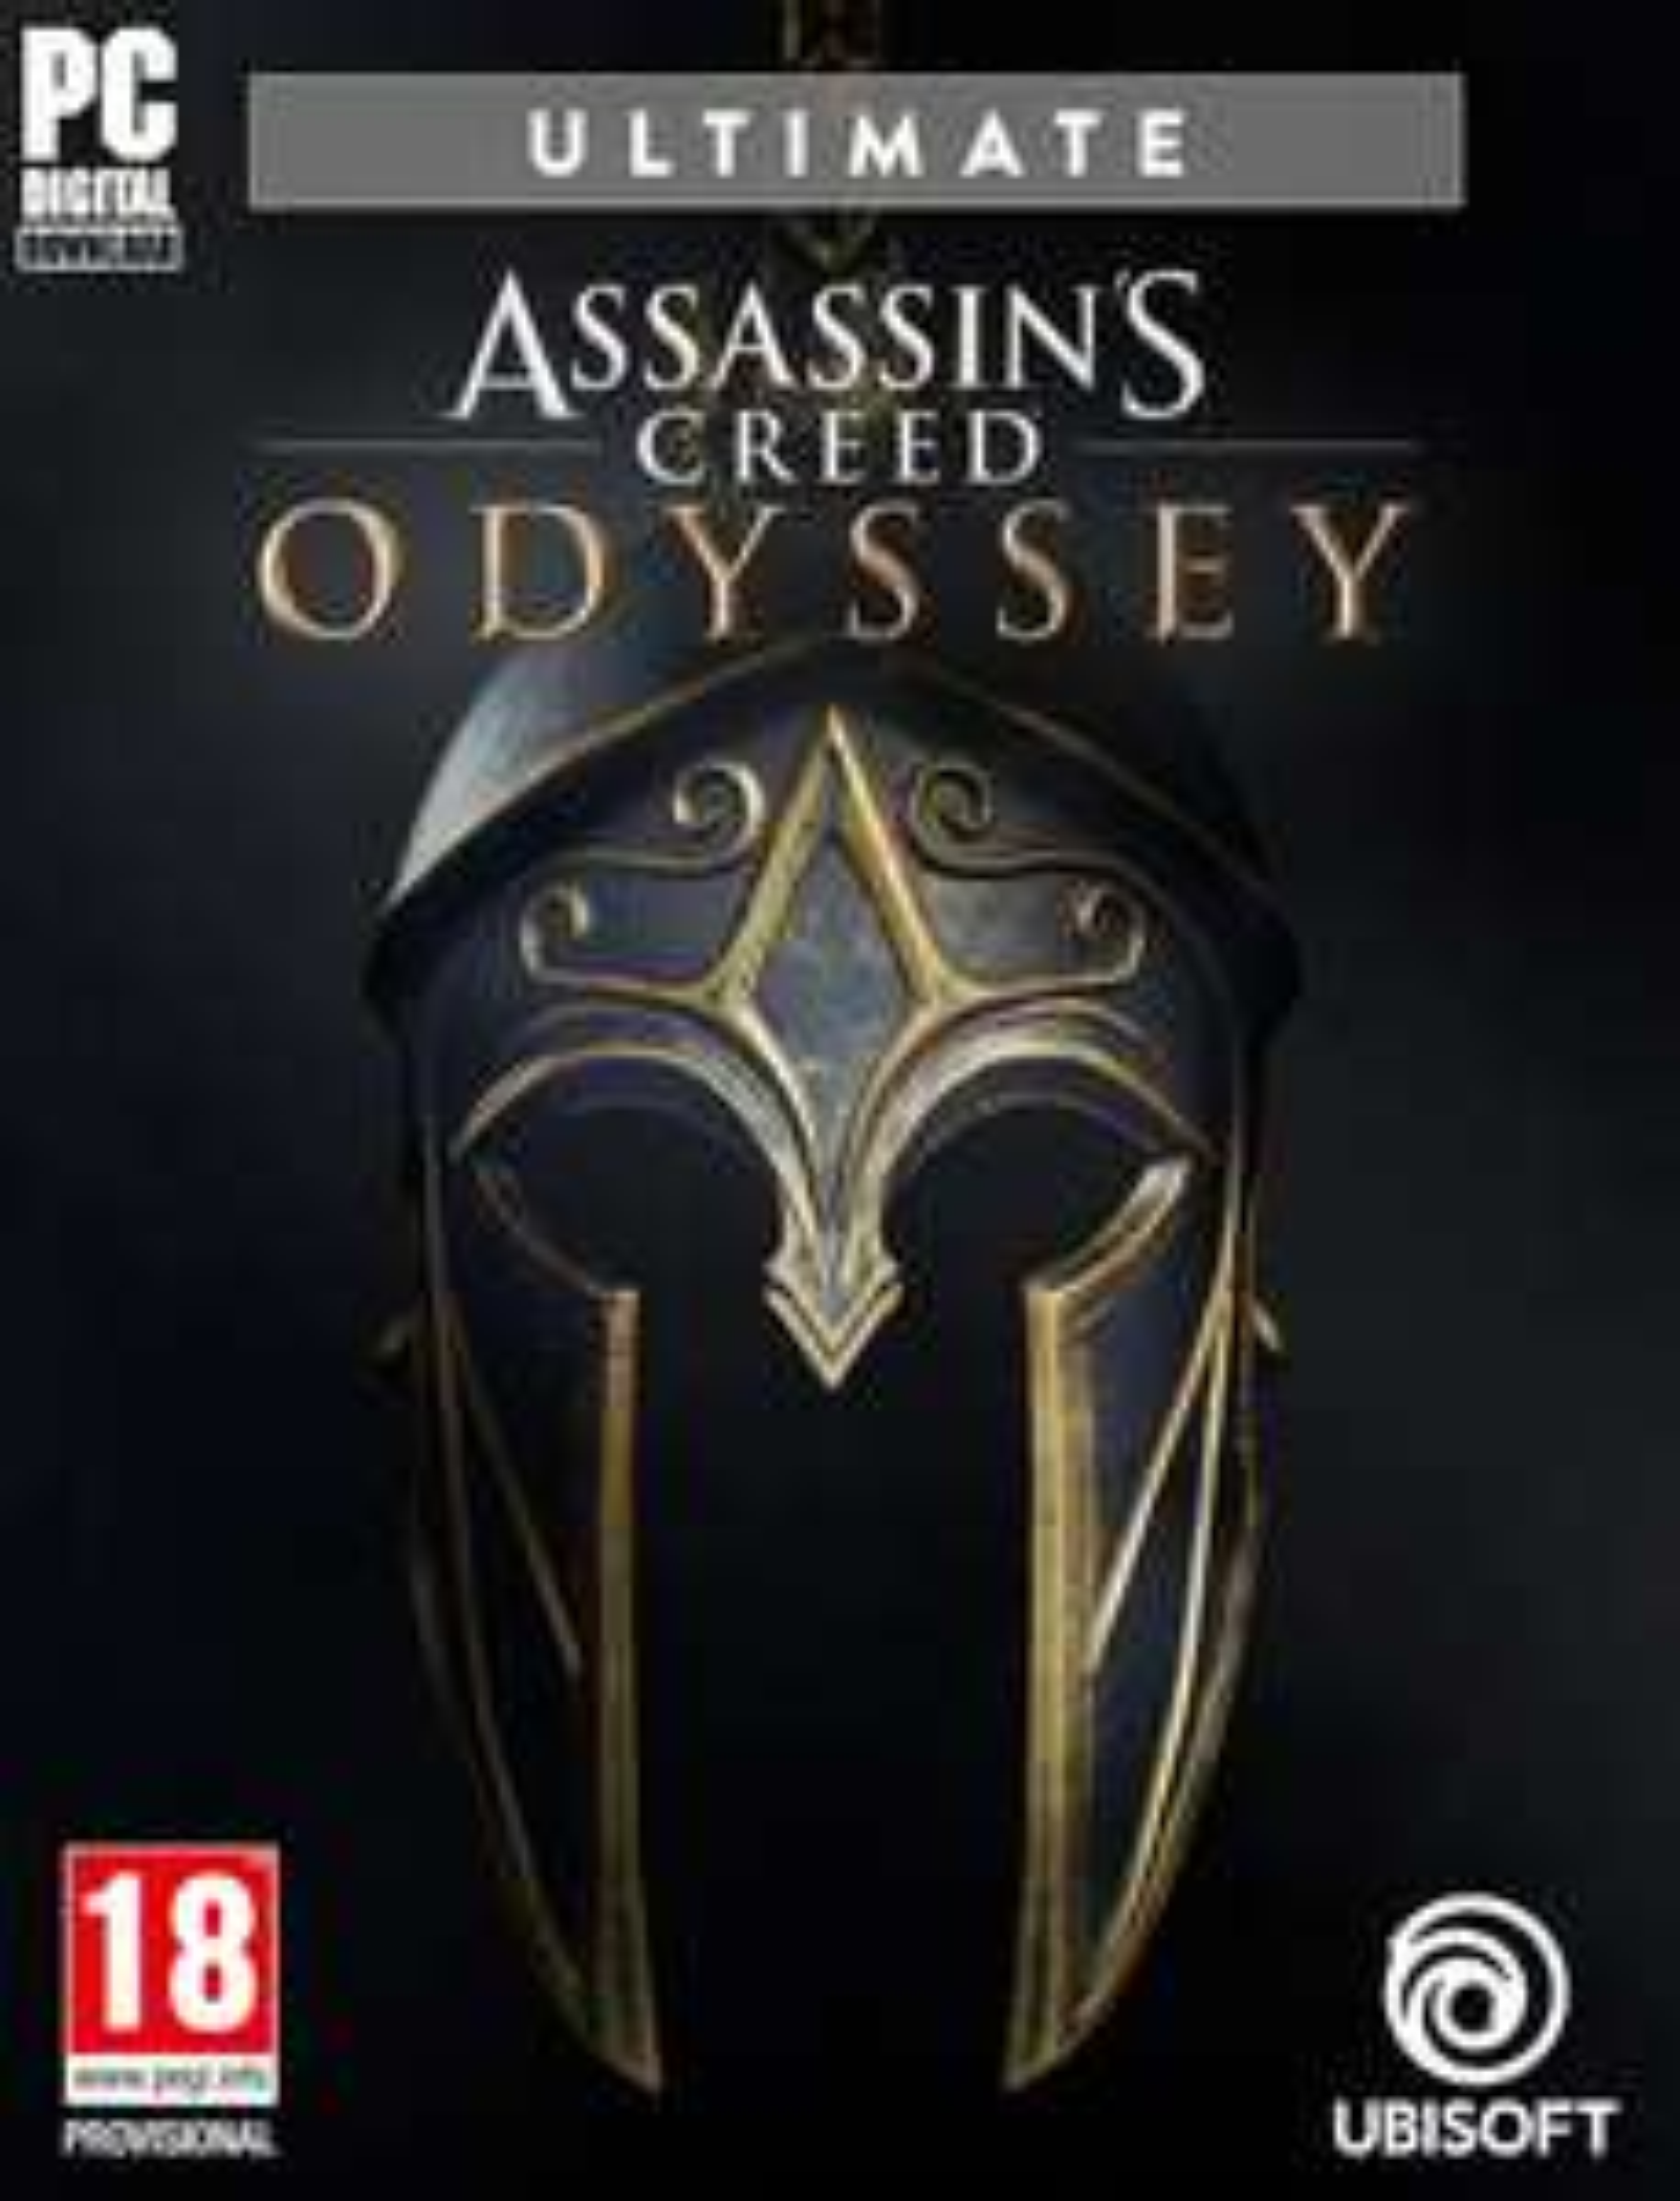 [Prime] Assassin's Creed Odyssey Ultimate Edition sur PC (Dématérialisé - Uplay)